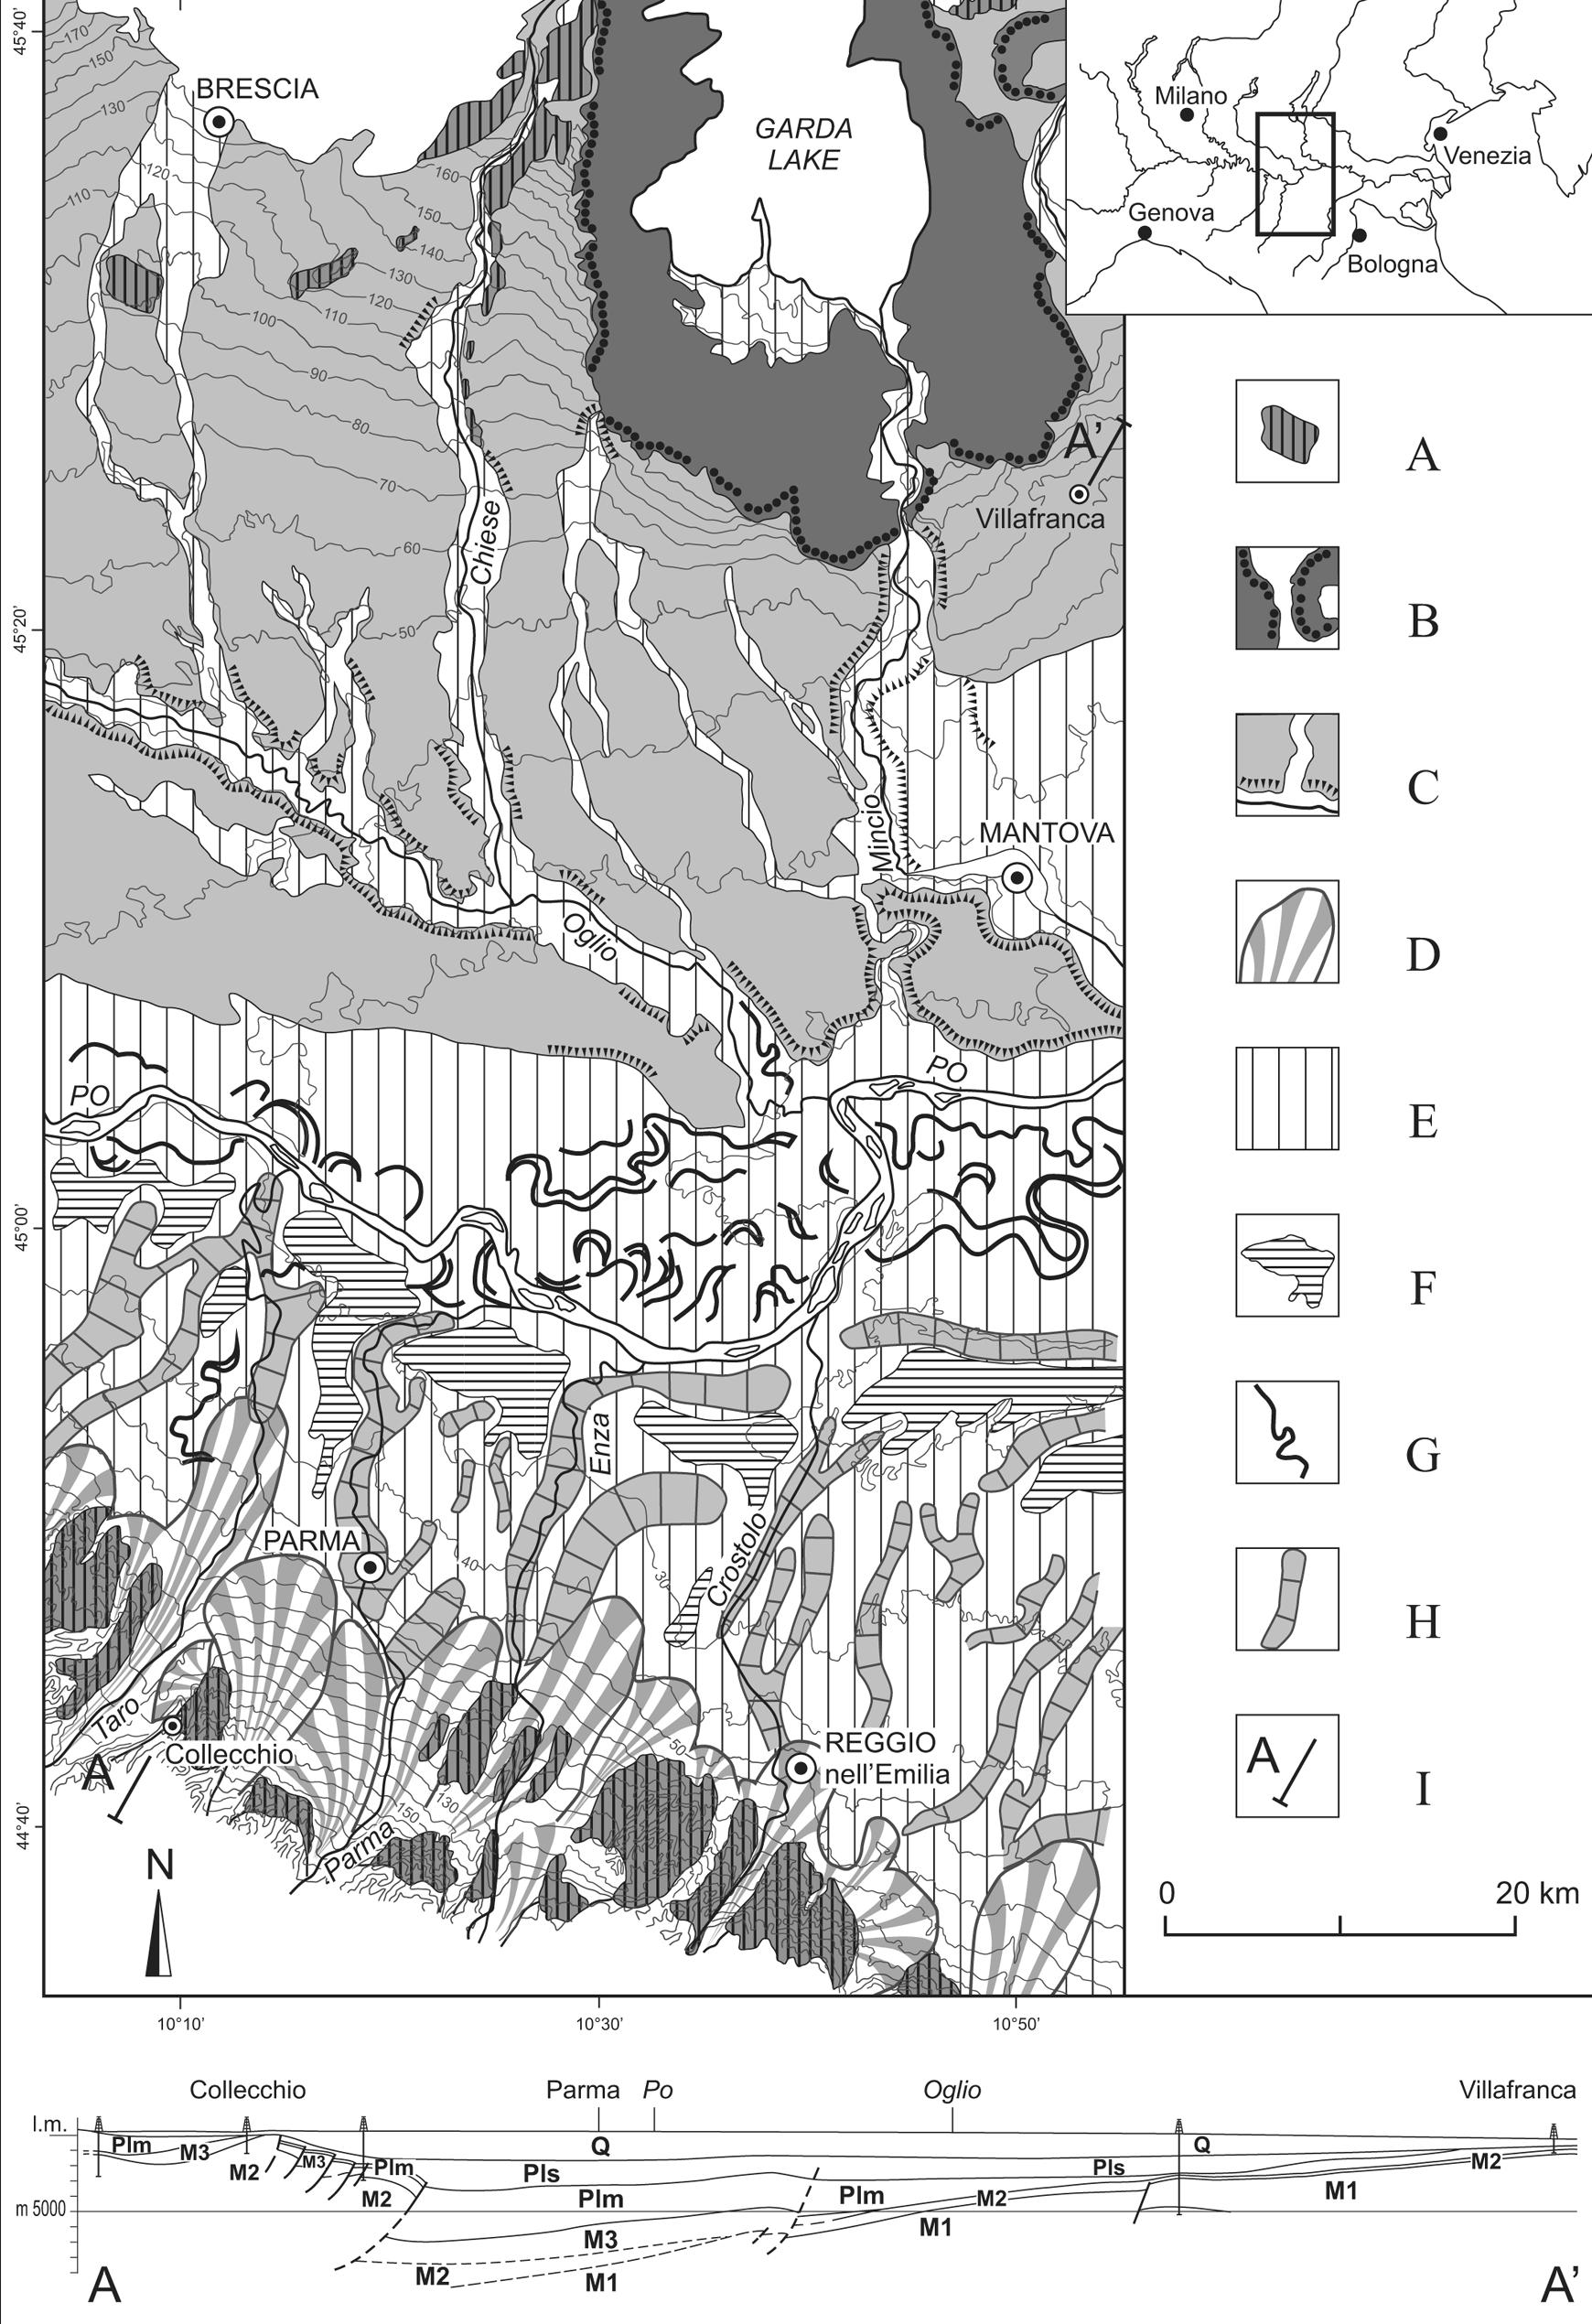 Separation Lame De Bois sub-boreal aggradation along the apennine margin of the